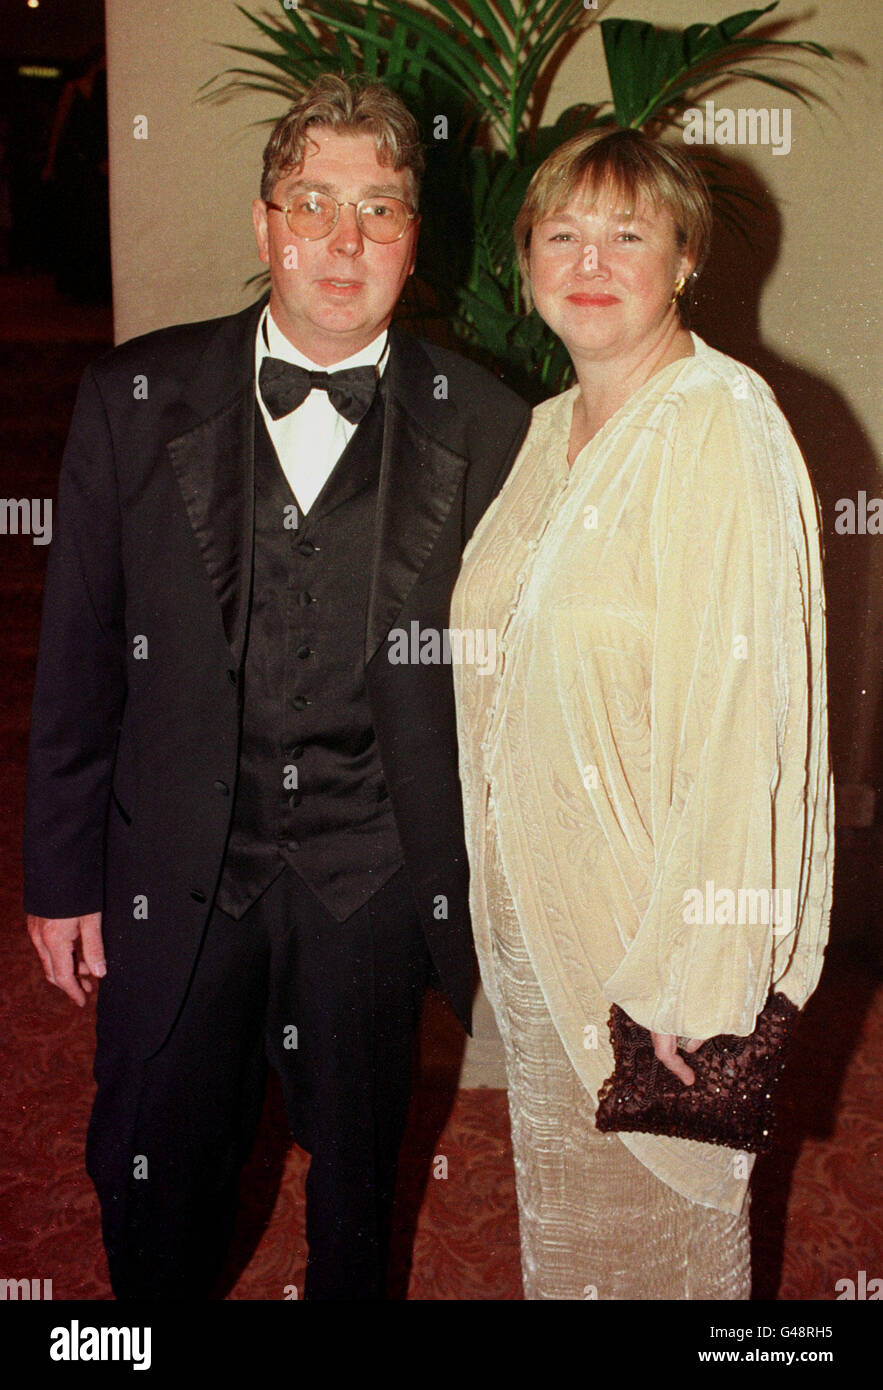 James McAvoy (born 1979) Erotic pics & movies Beverly Hills (actress),Cathy DeBuono